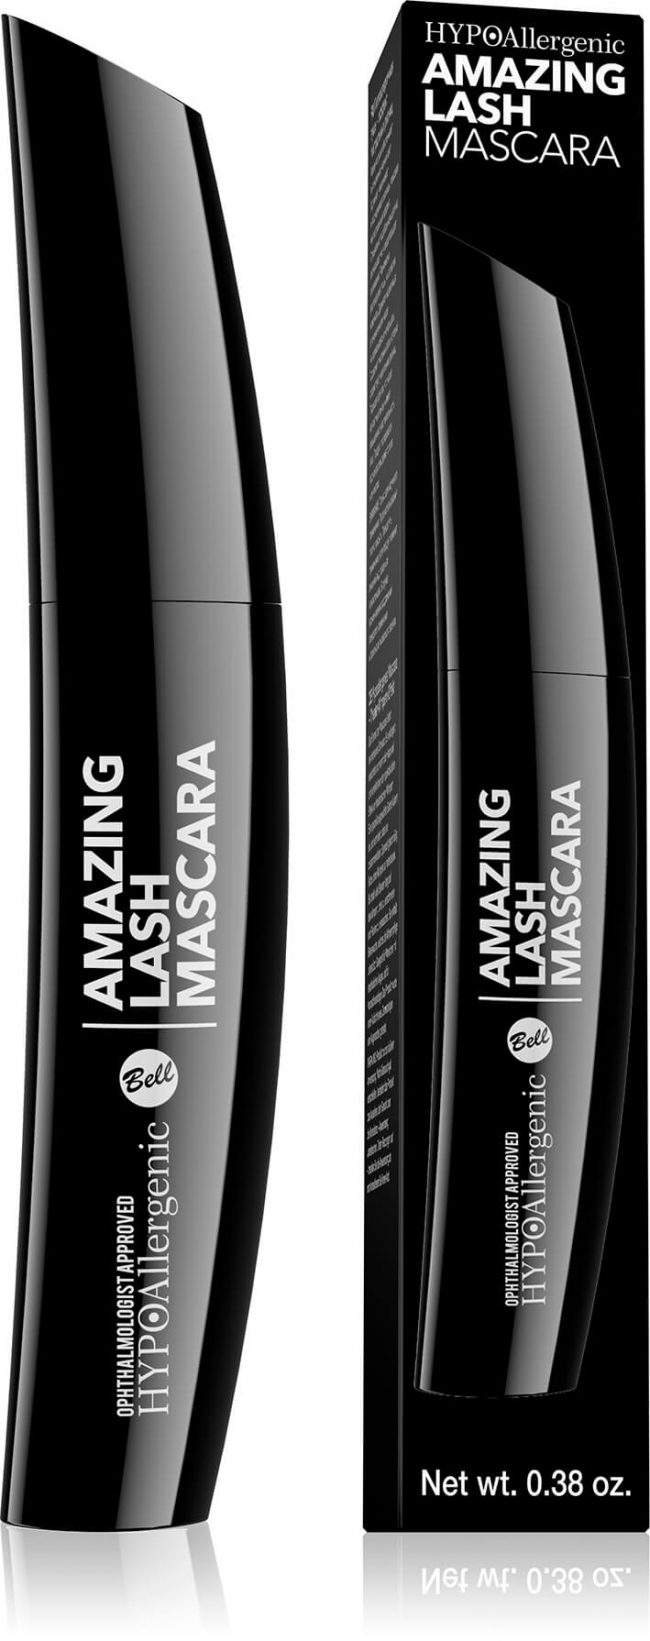 HYPOAllergenic Amazing Lash Mascara